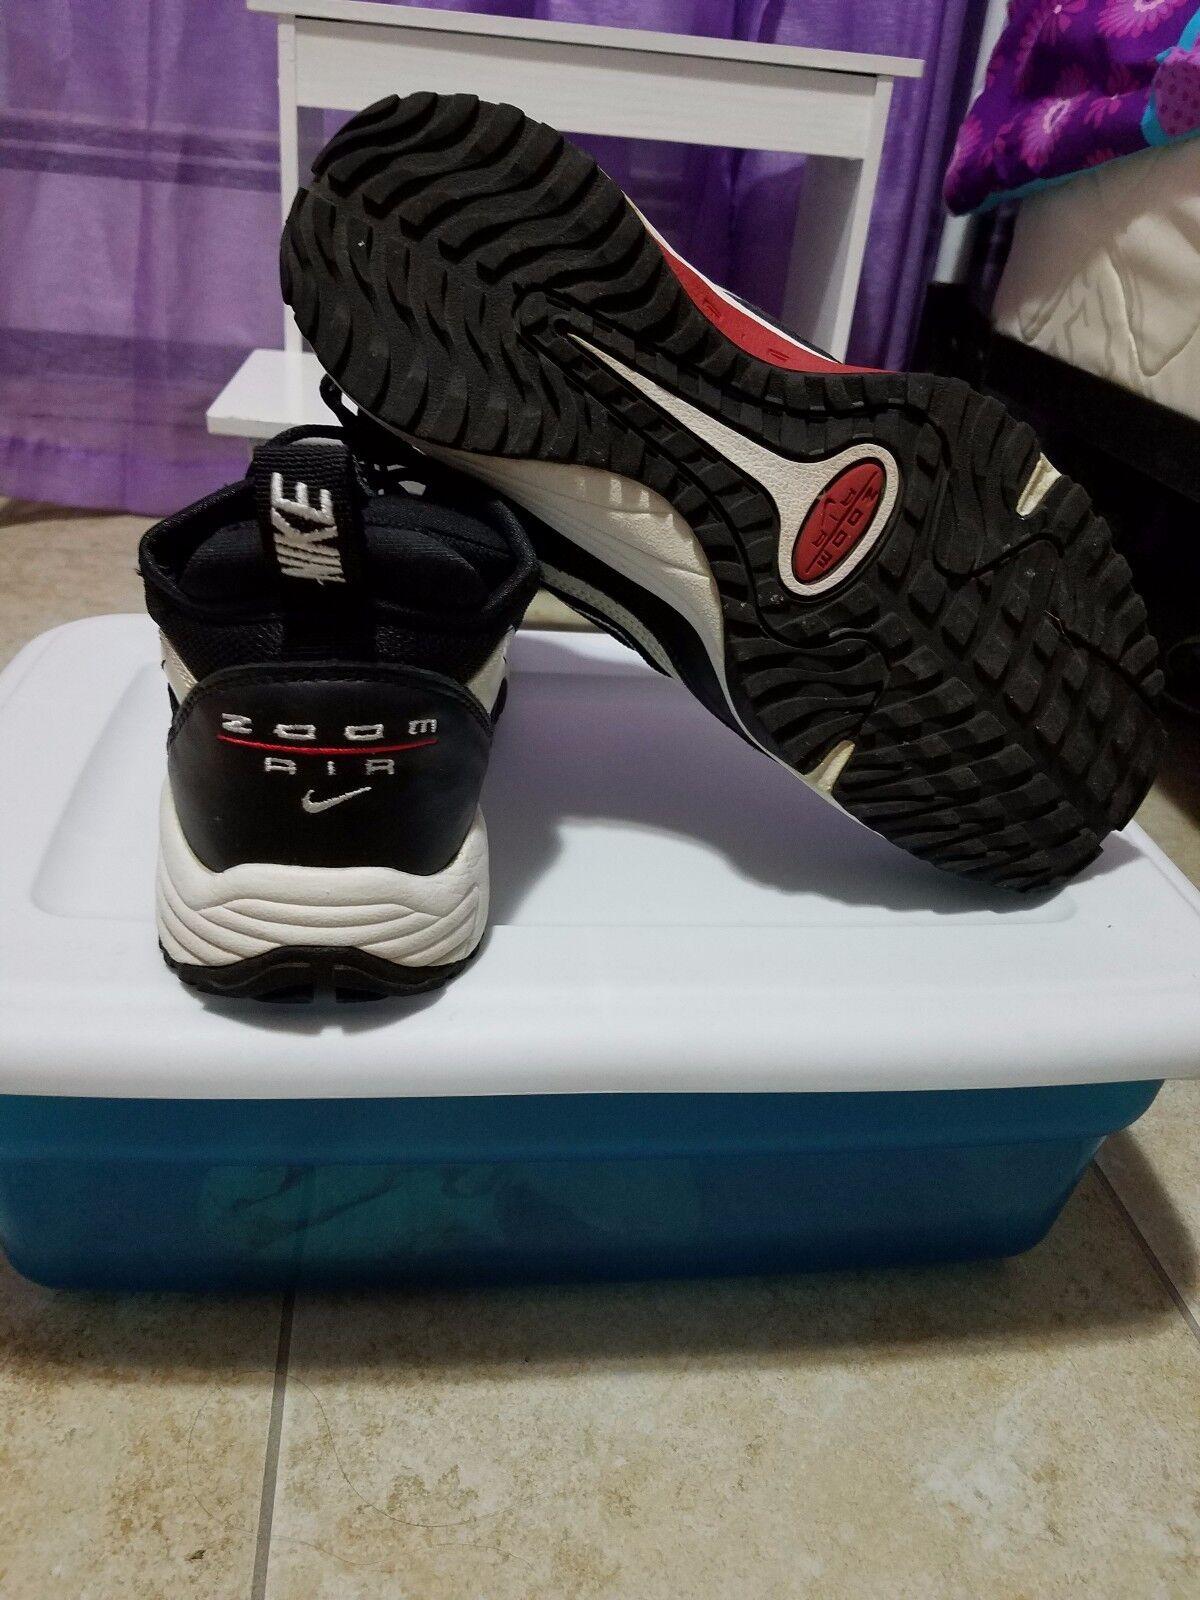 Nike air k-low 1998 (männer -) größe größe größe 10. db01f3